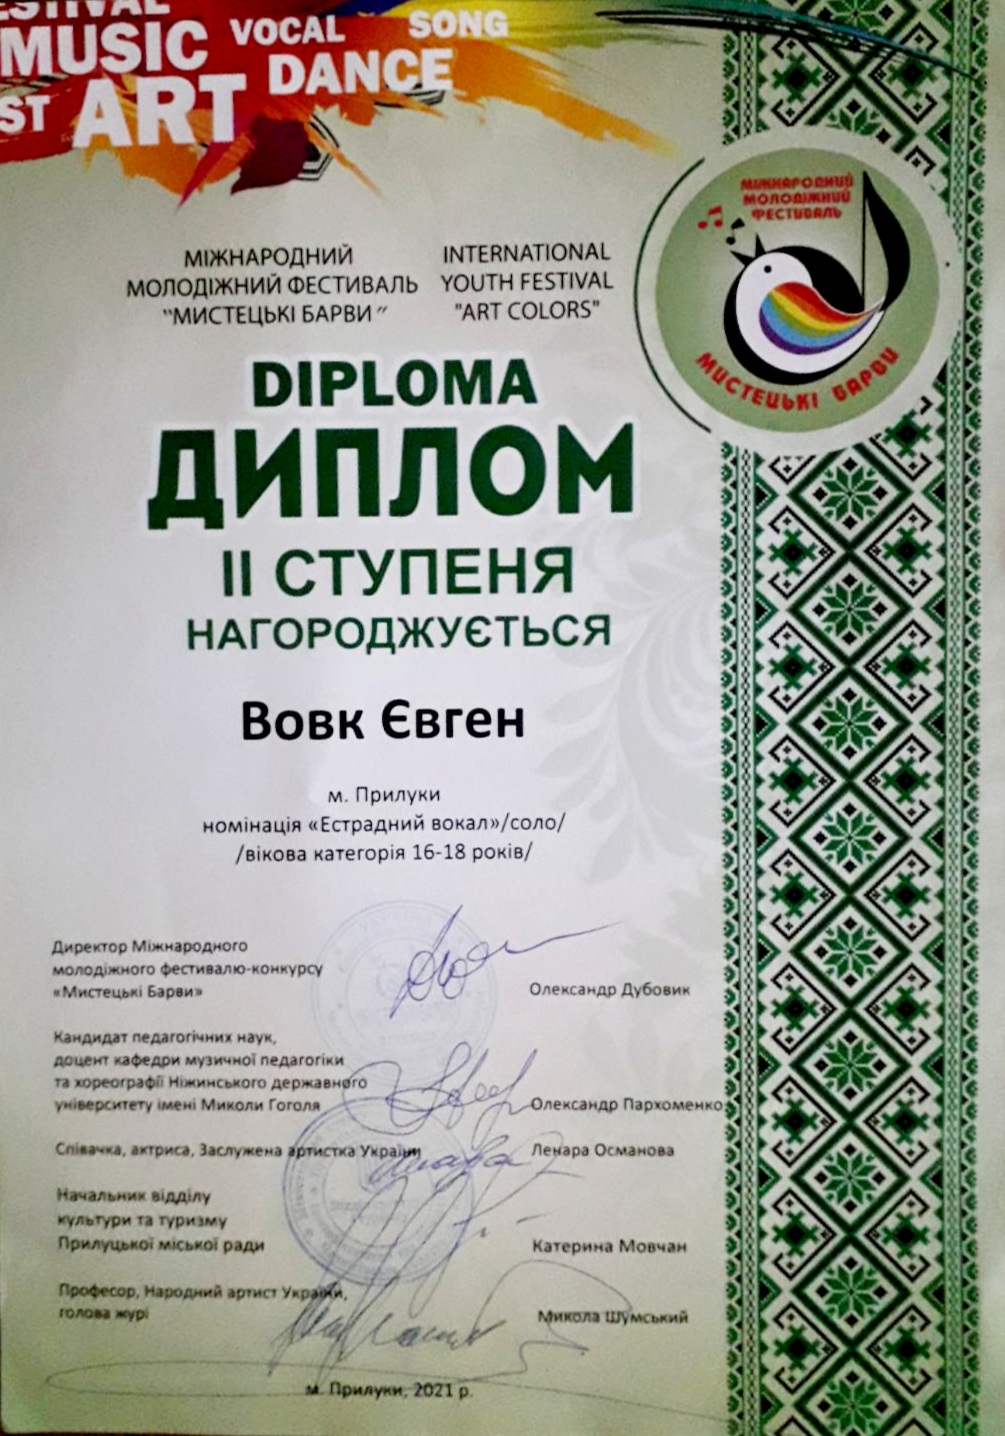 http://agrokoledg.at.ua/avatar/documents/vuhovna/hydoznjasam/20210326_105745.jpg